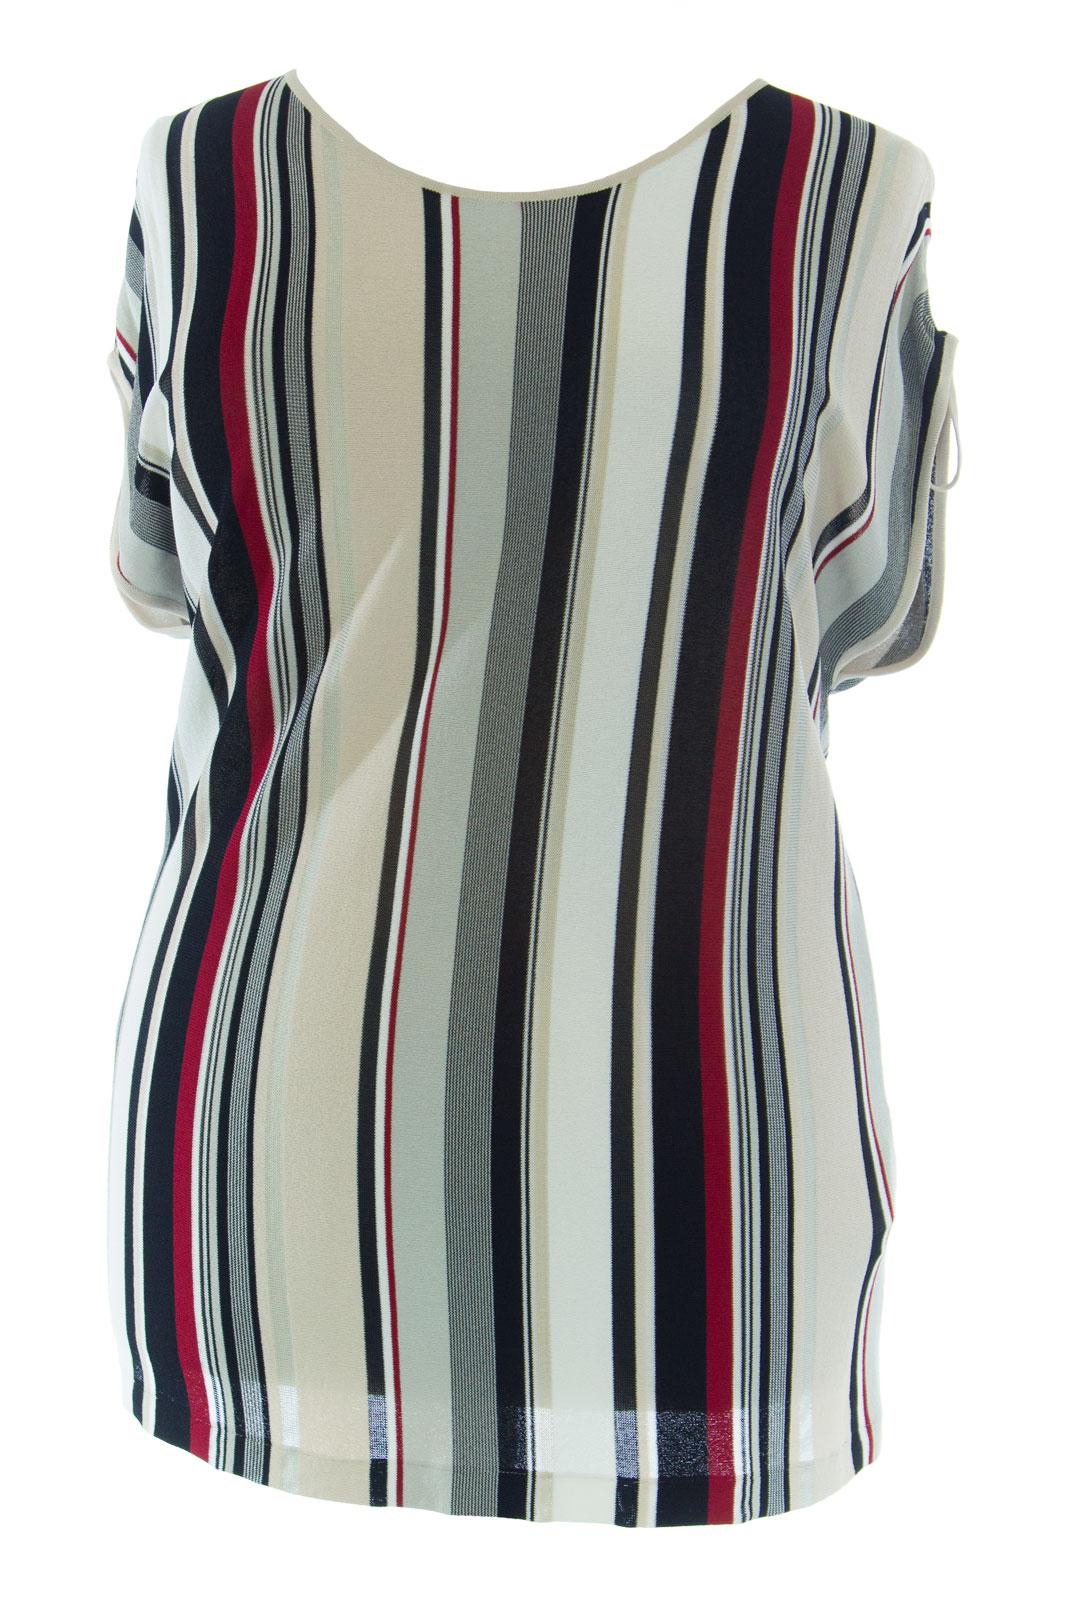 MARINA RINALDI by MaxMara Ravarino Multi-Farbe Striped Knit Top  NWT